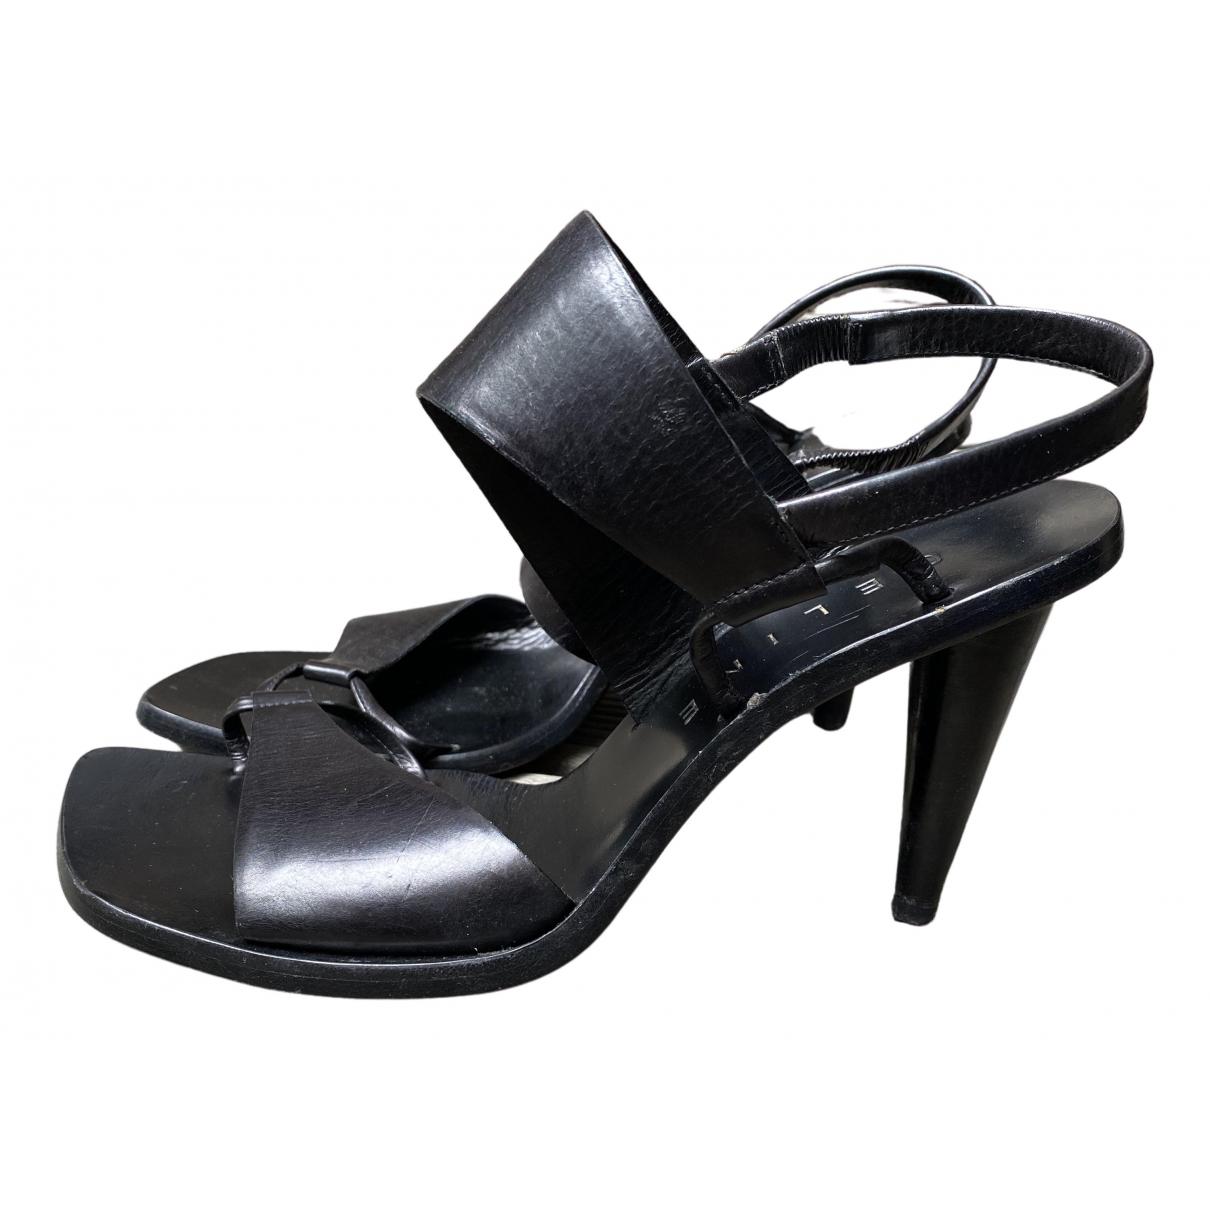 Celine Glove Heel Sandalen in  Schwarz Leder